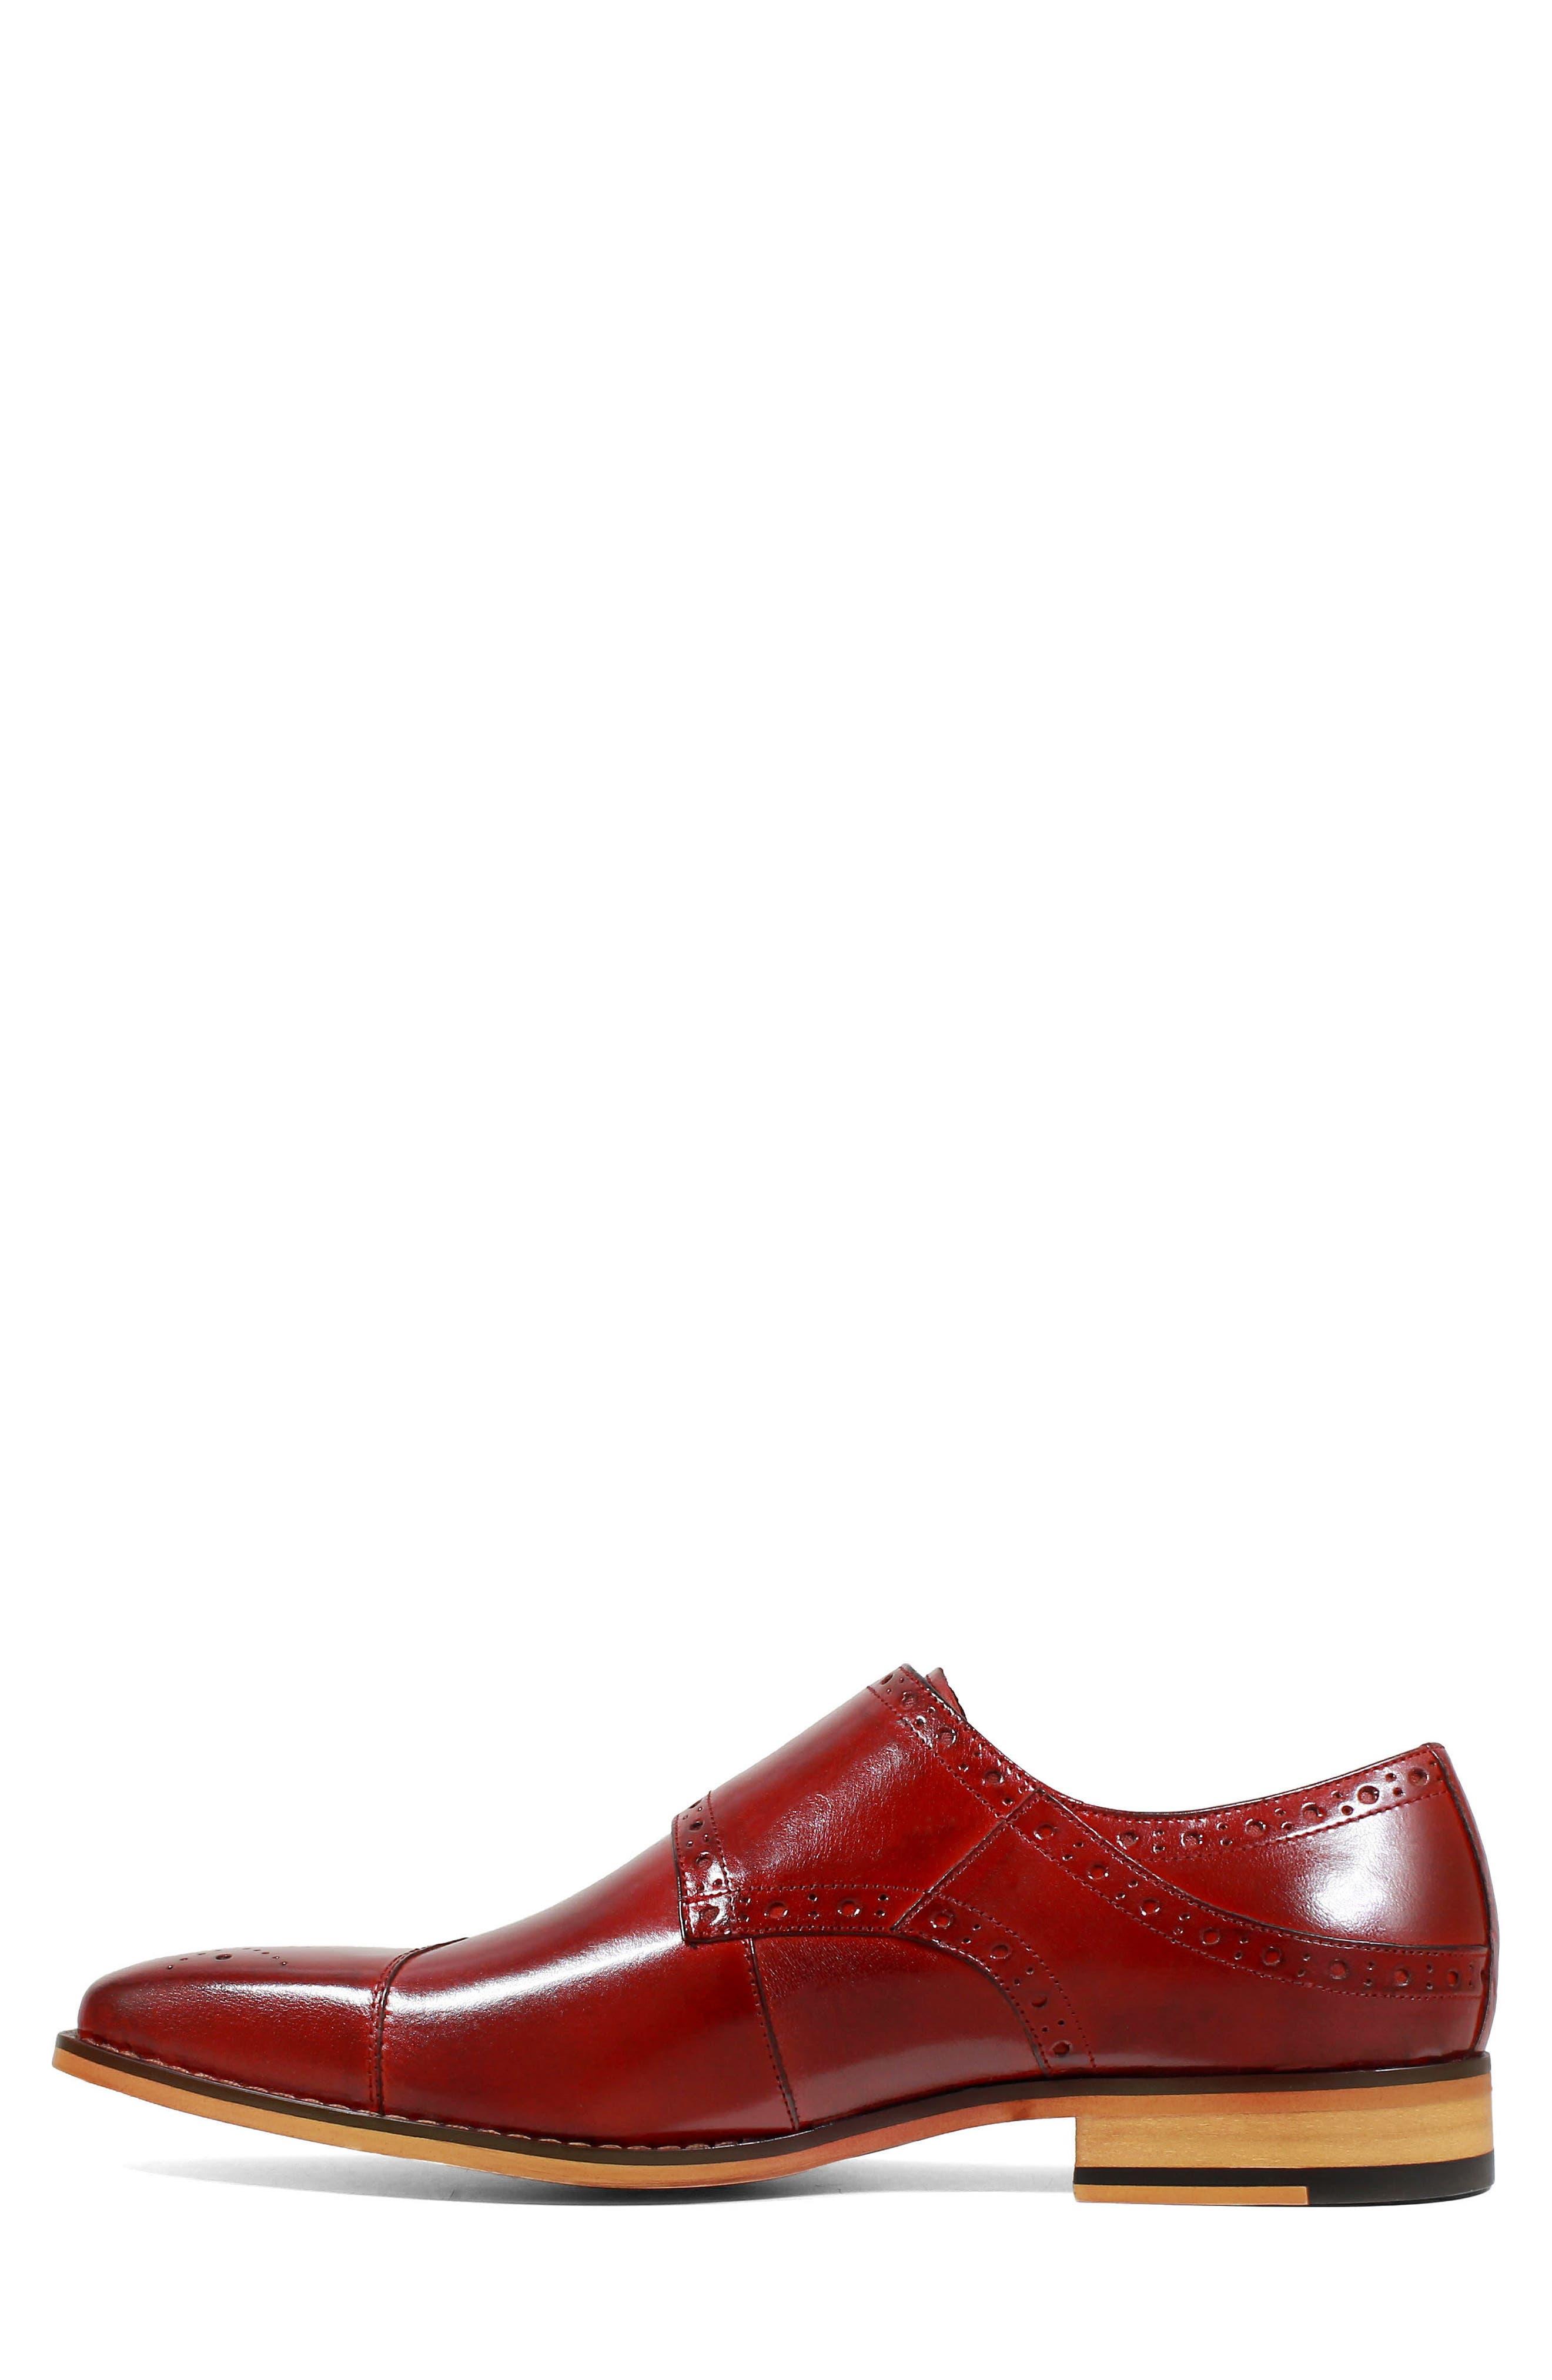 Tayton Cap Toe Double Strap Monk Shoe,                             Alternate thumbnail 8, color,                             RED LEATHER